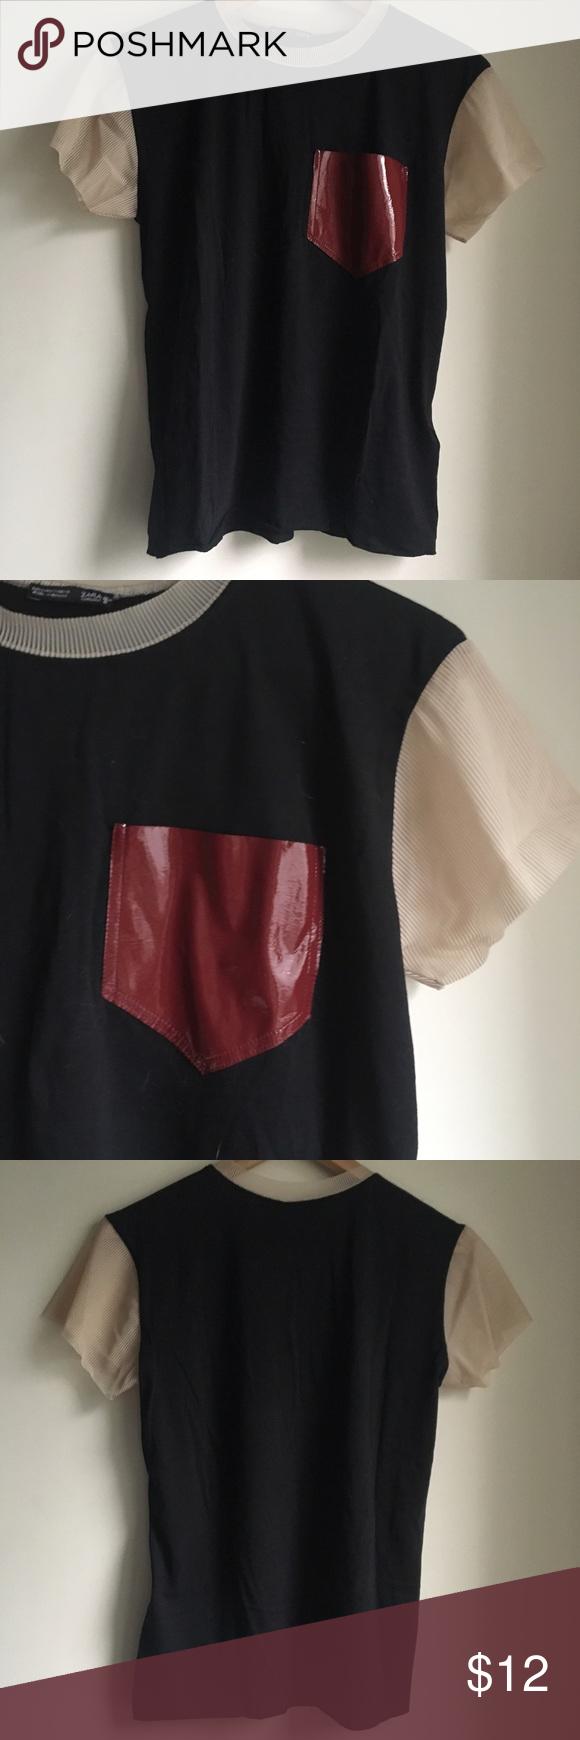 Zara detailed Tee Zara tee with fun details. Mesh like sleeves. Faux patent leather pocket. Never worn Zara Tops Tees - Short Sleeve